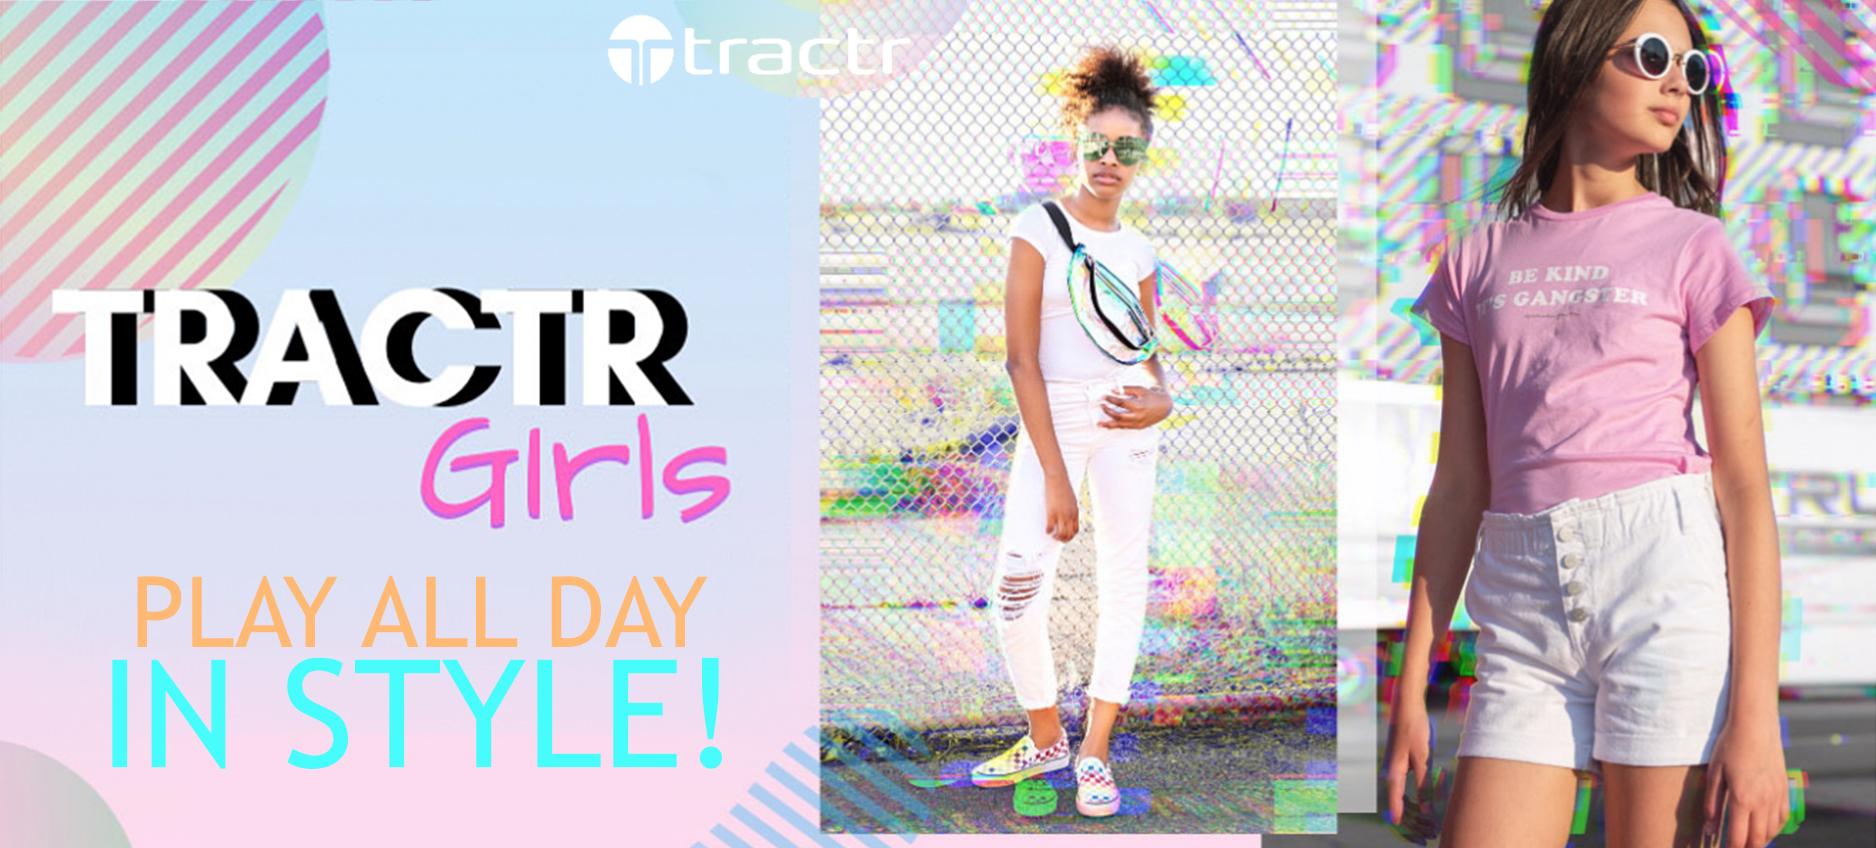 Tractr-Girls